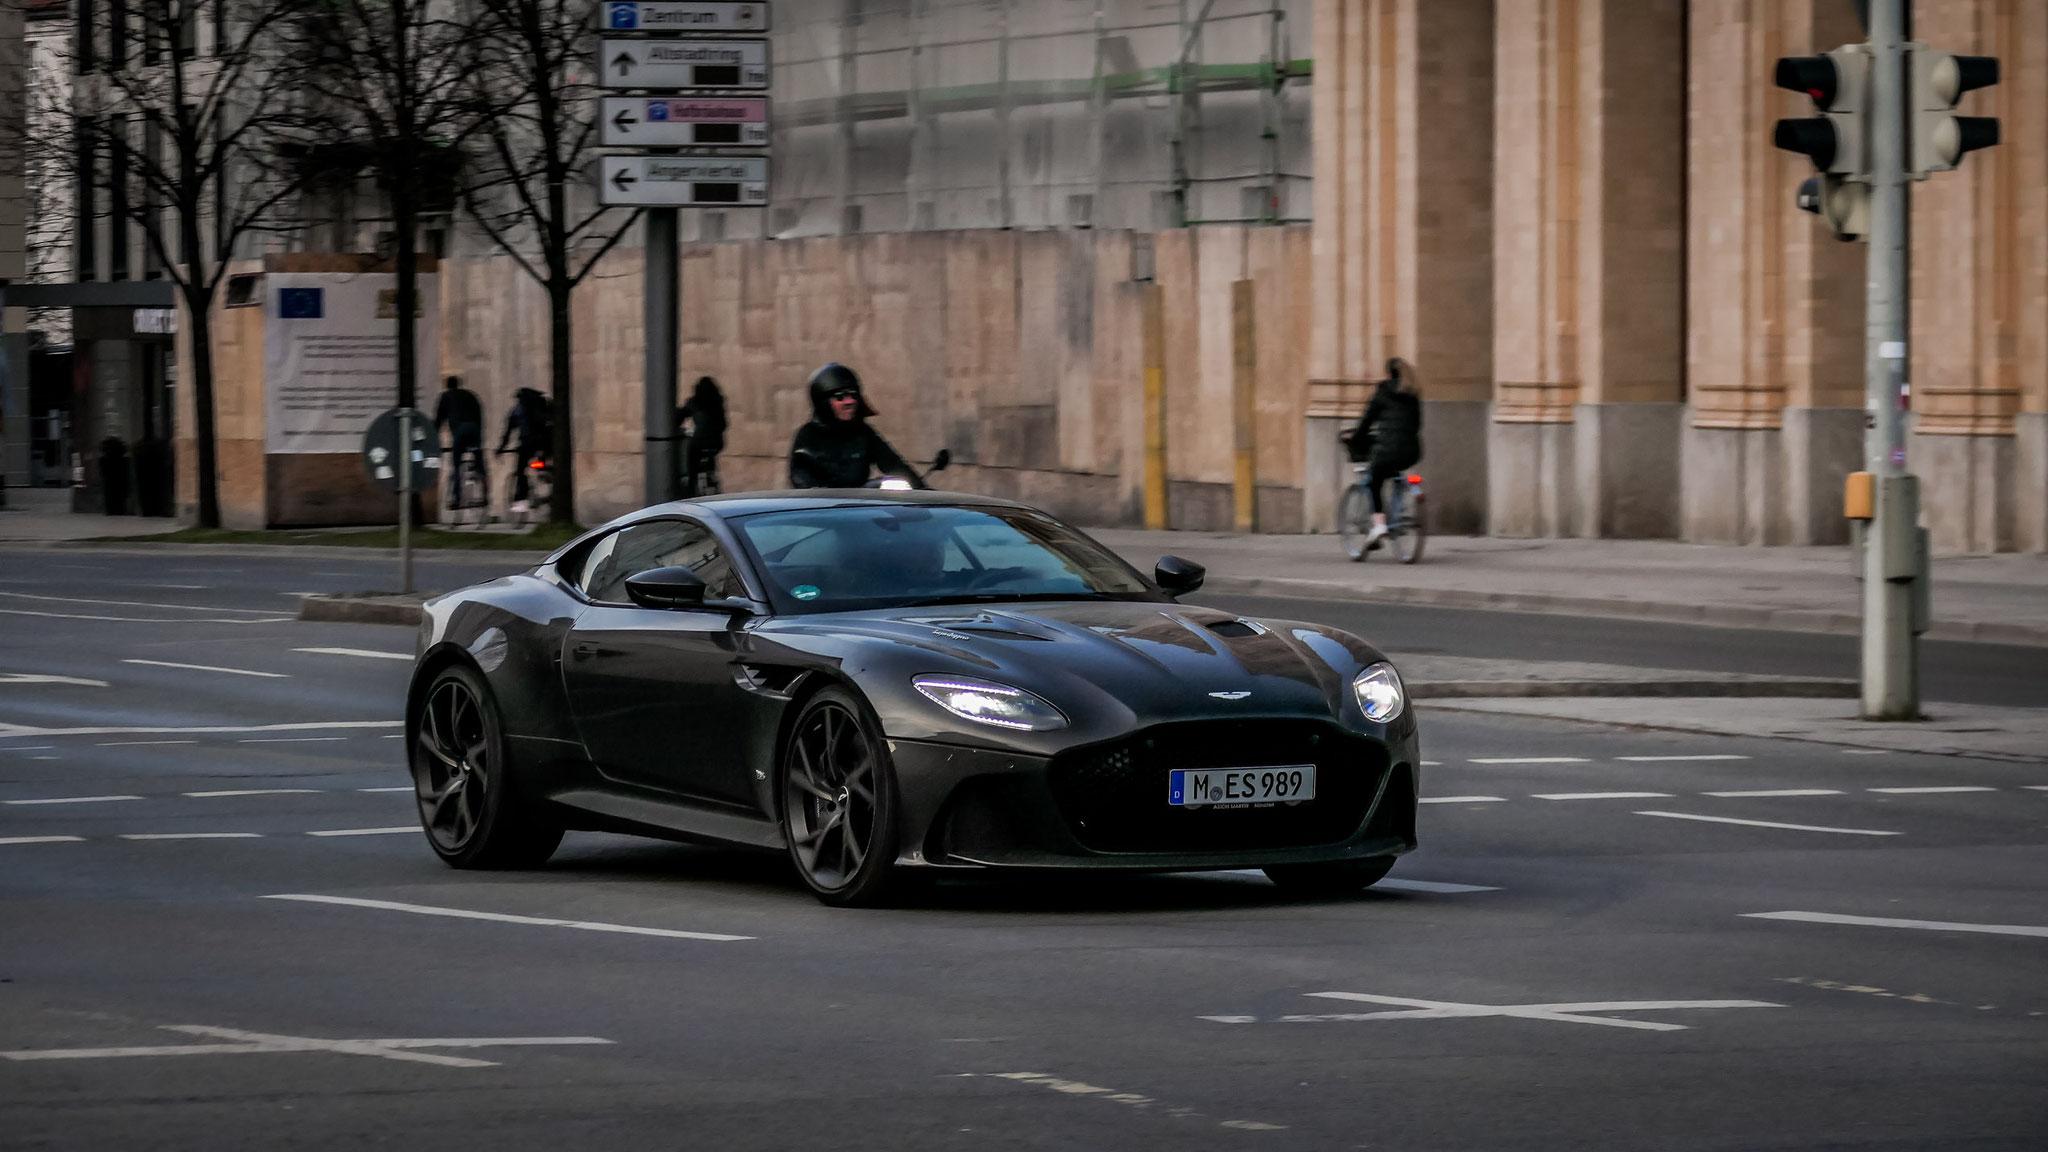 Aston Martin DBS Superleggera - M-ES-989